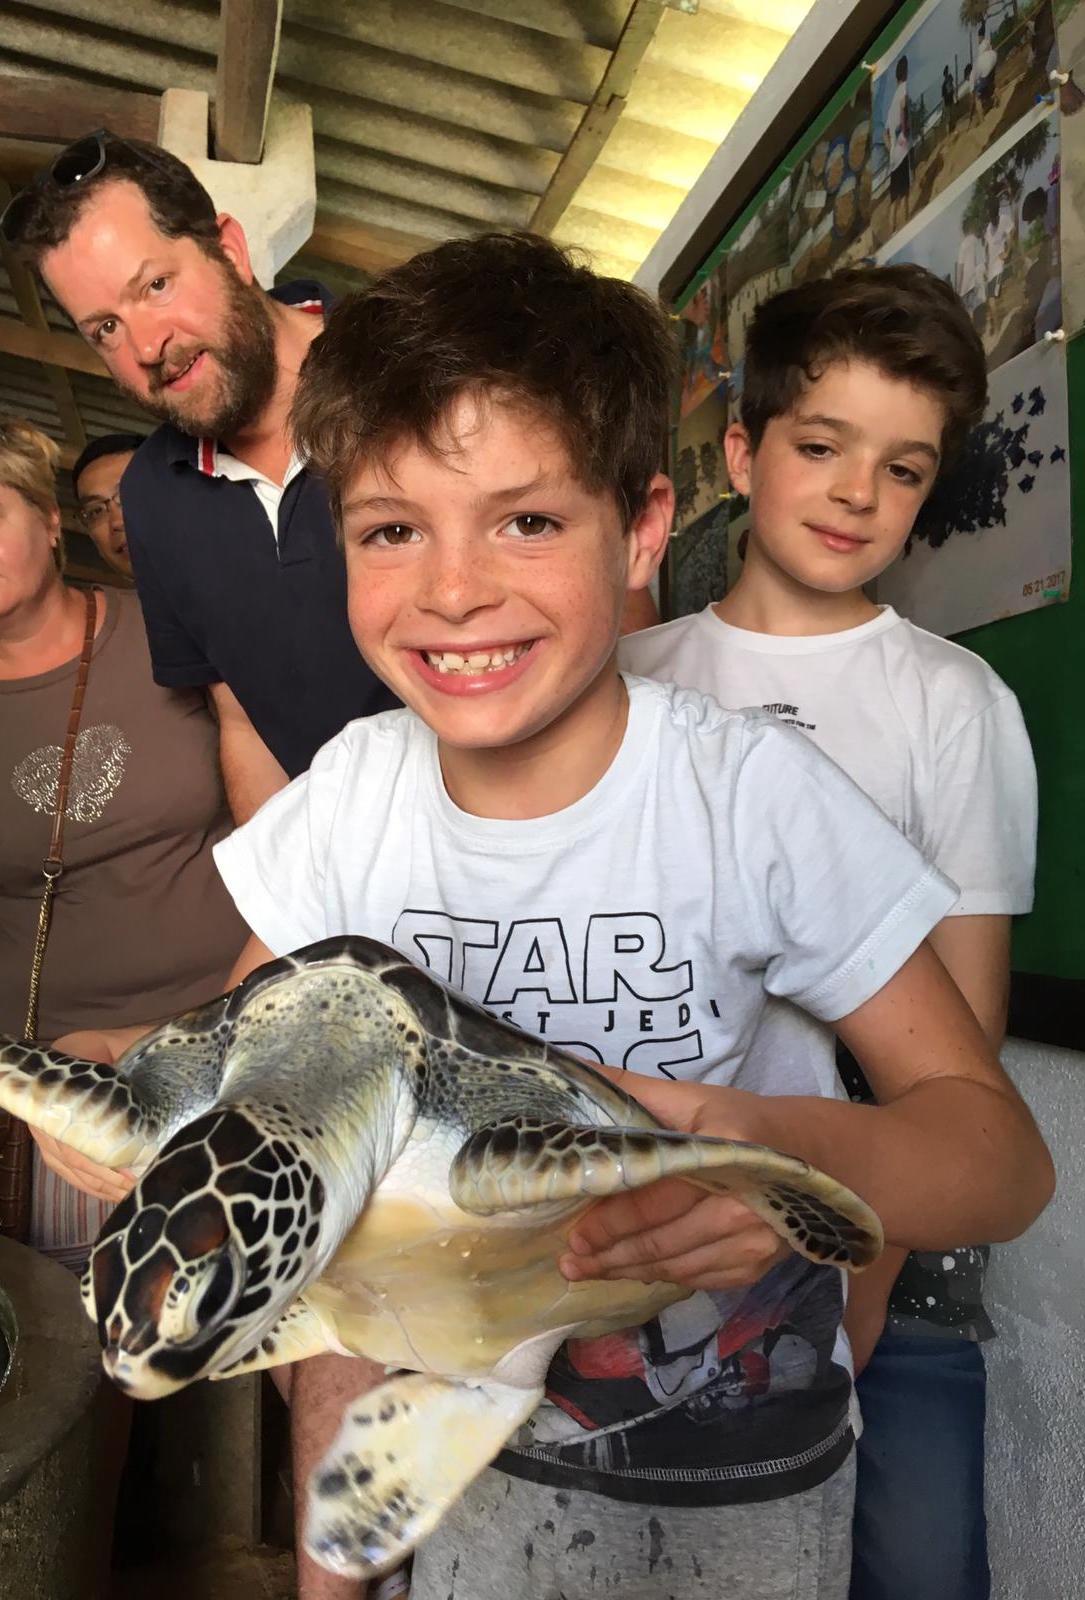 invite-to-paradise-sri-lanka-family-holiday-specialists-customer-feedback-pickering-sea-turtle-hold 2.jpg